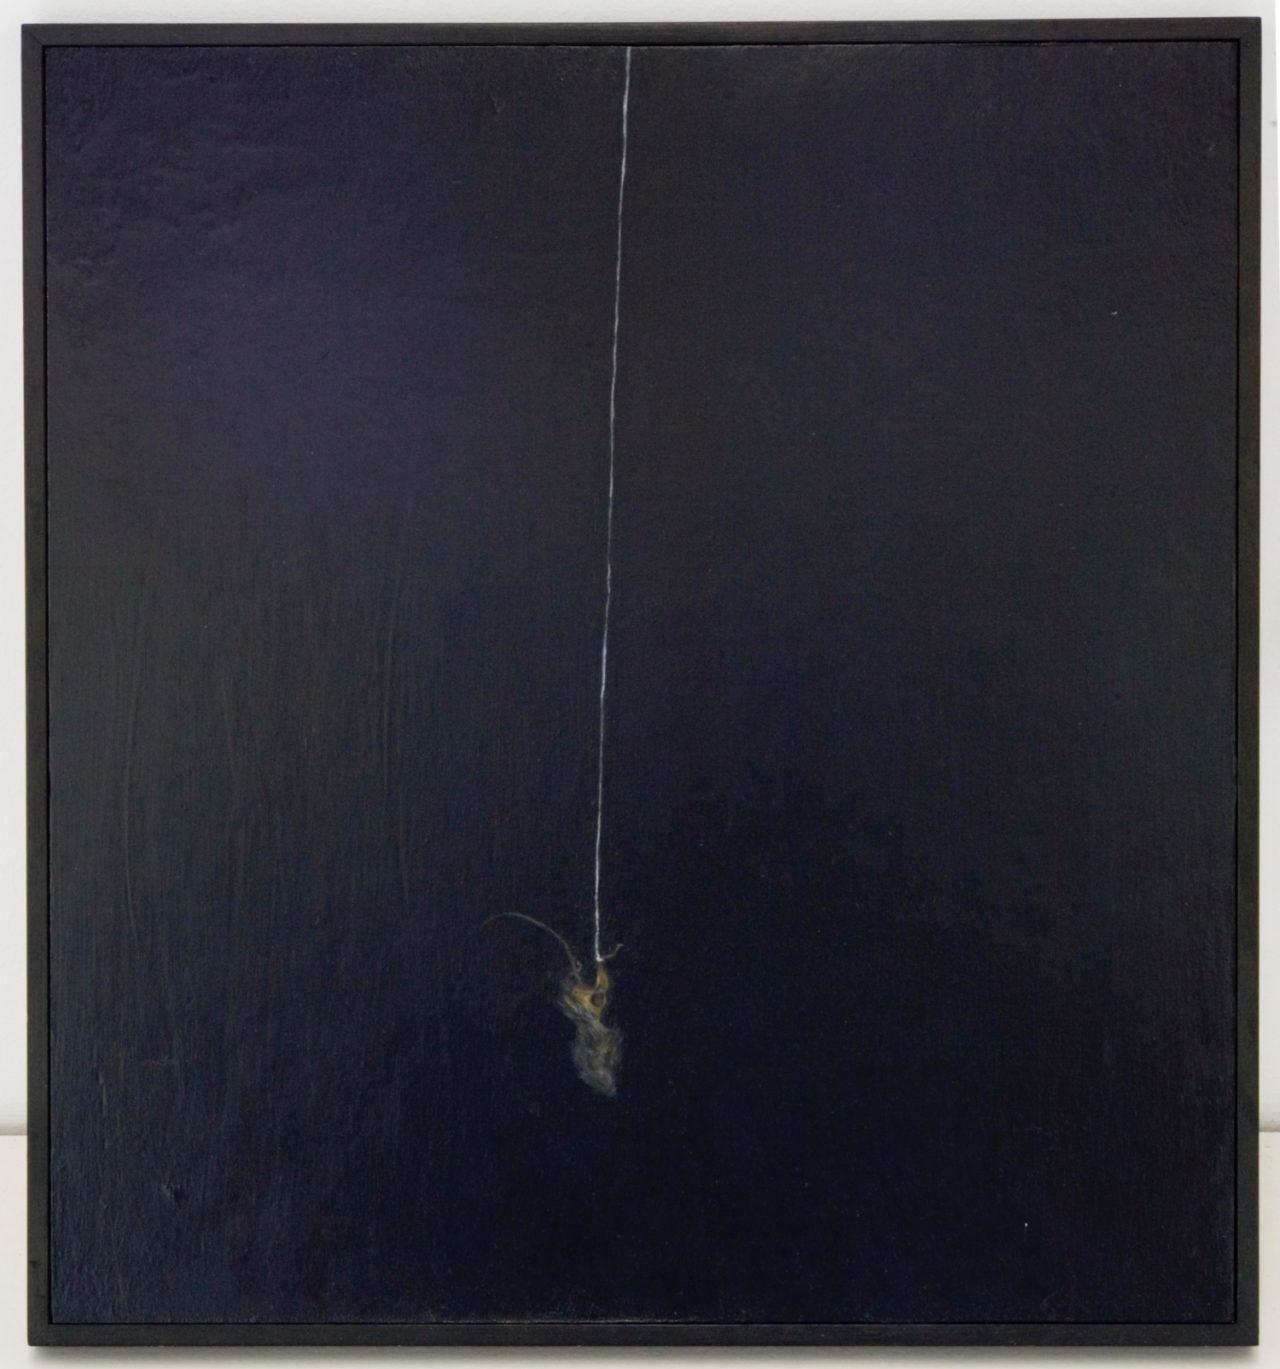 Rodney McMillian, Lilly (2004)